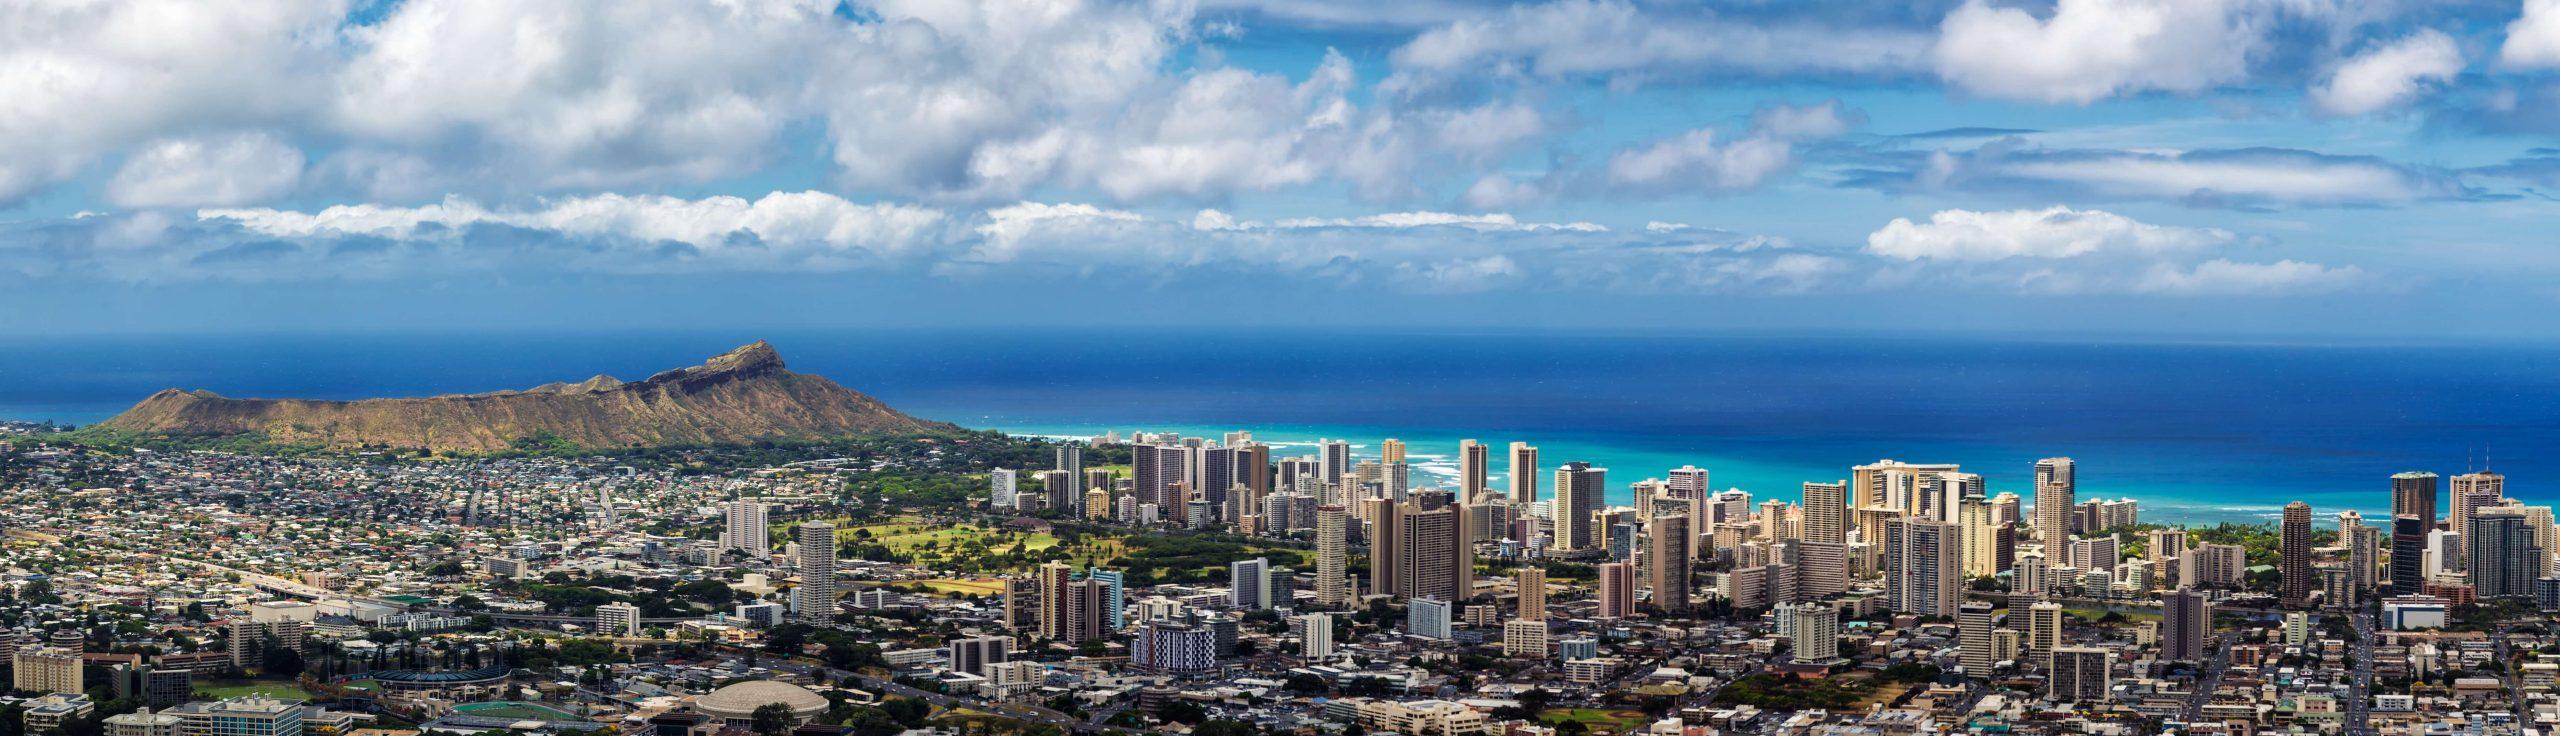 Magnum Helicopter Ride-Waikiki, Oahu, Hawaii